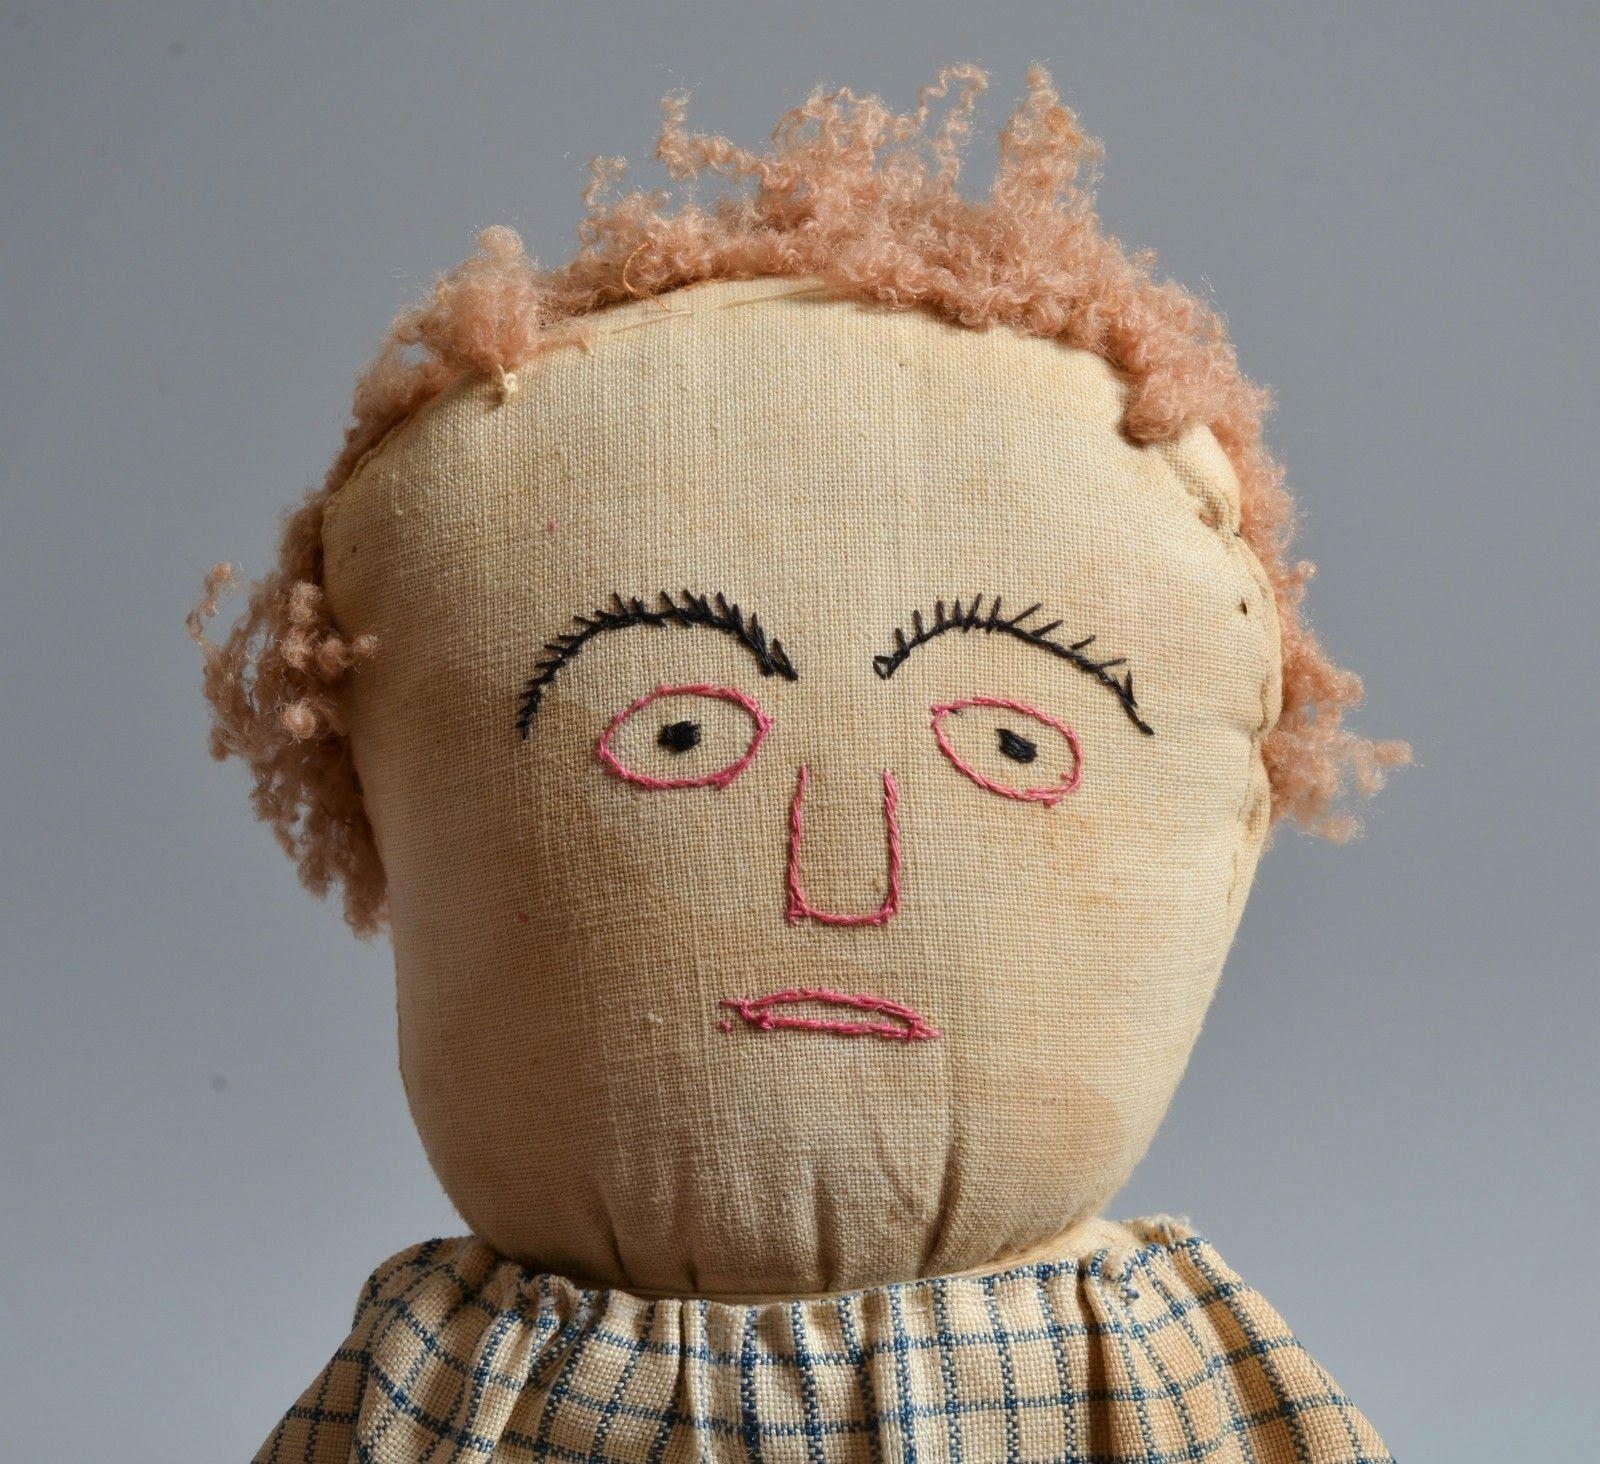 folk art rag doll (principio siglo XX)